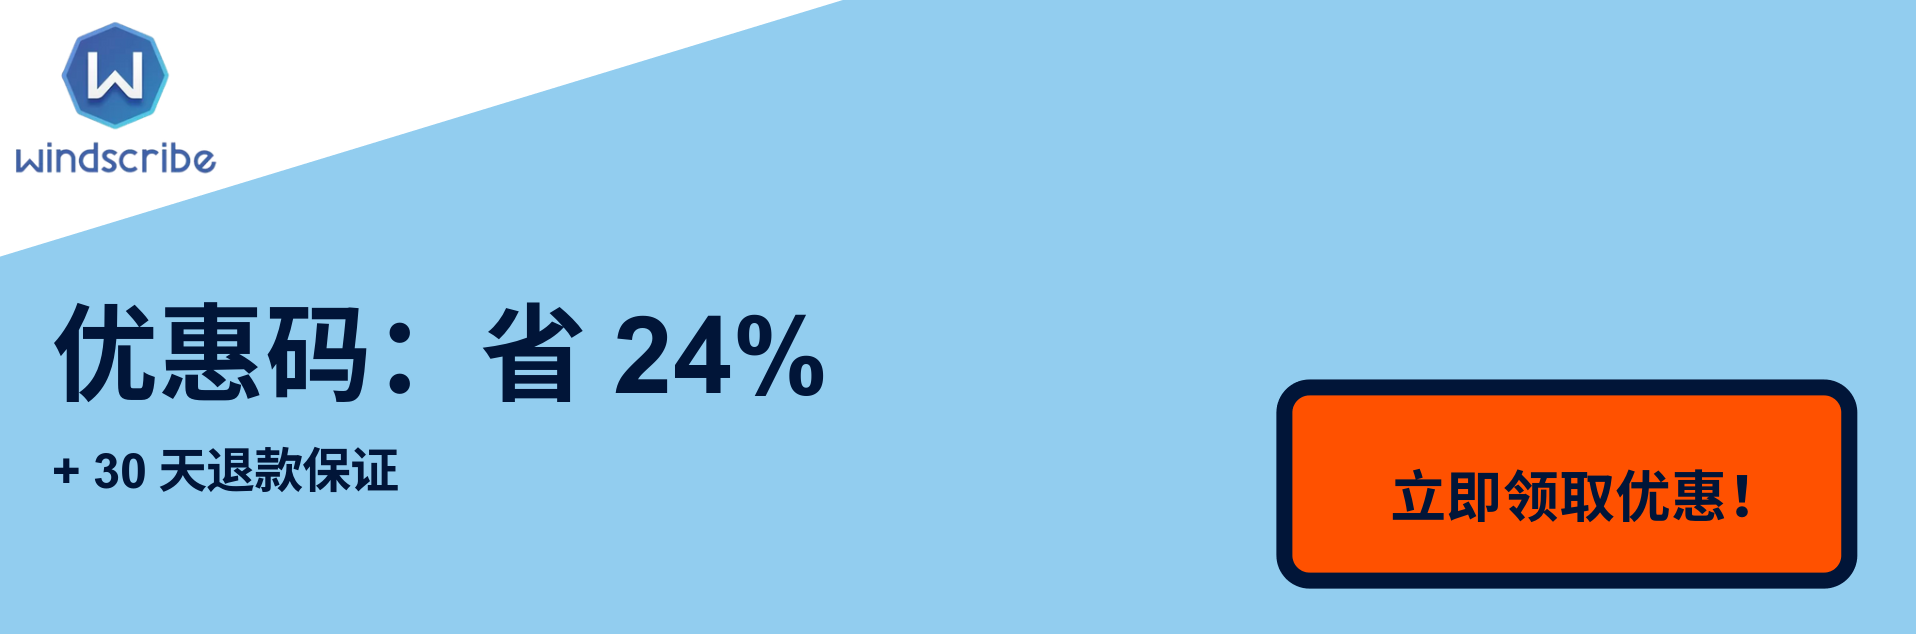 windscribe vpn coupon banner 24% off